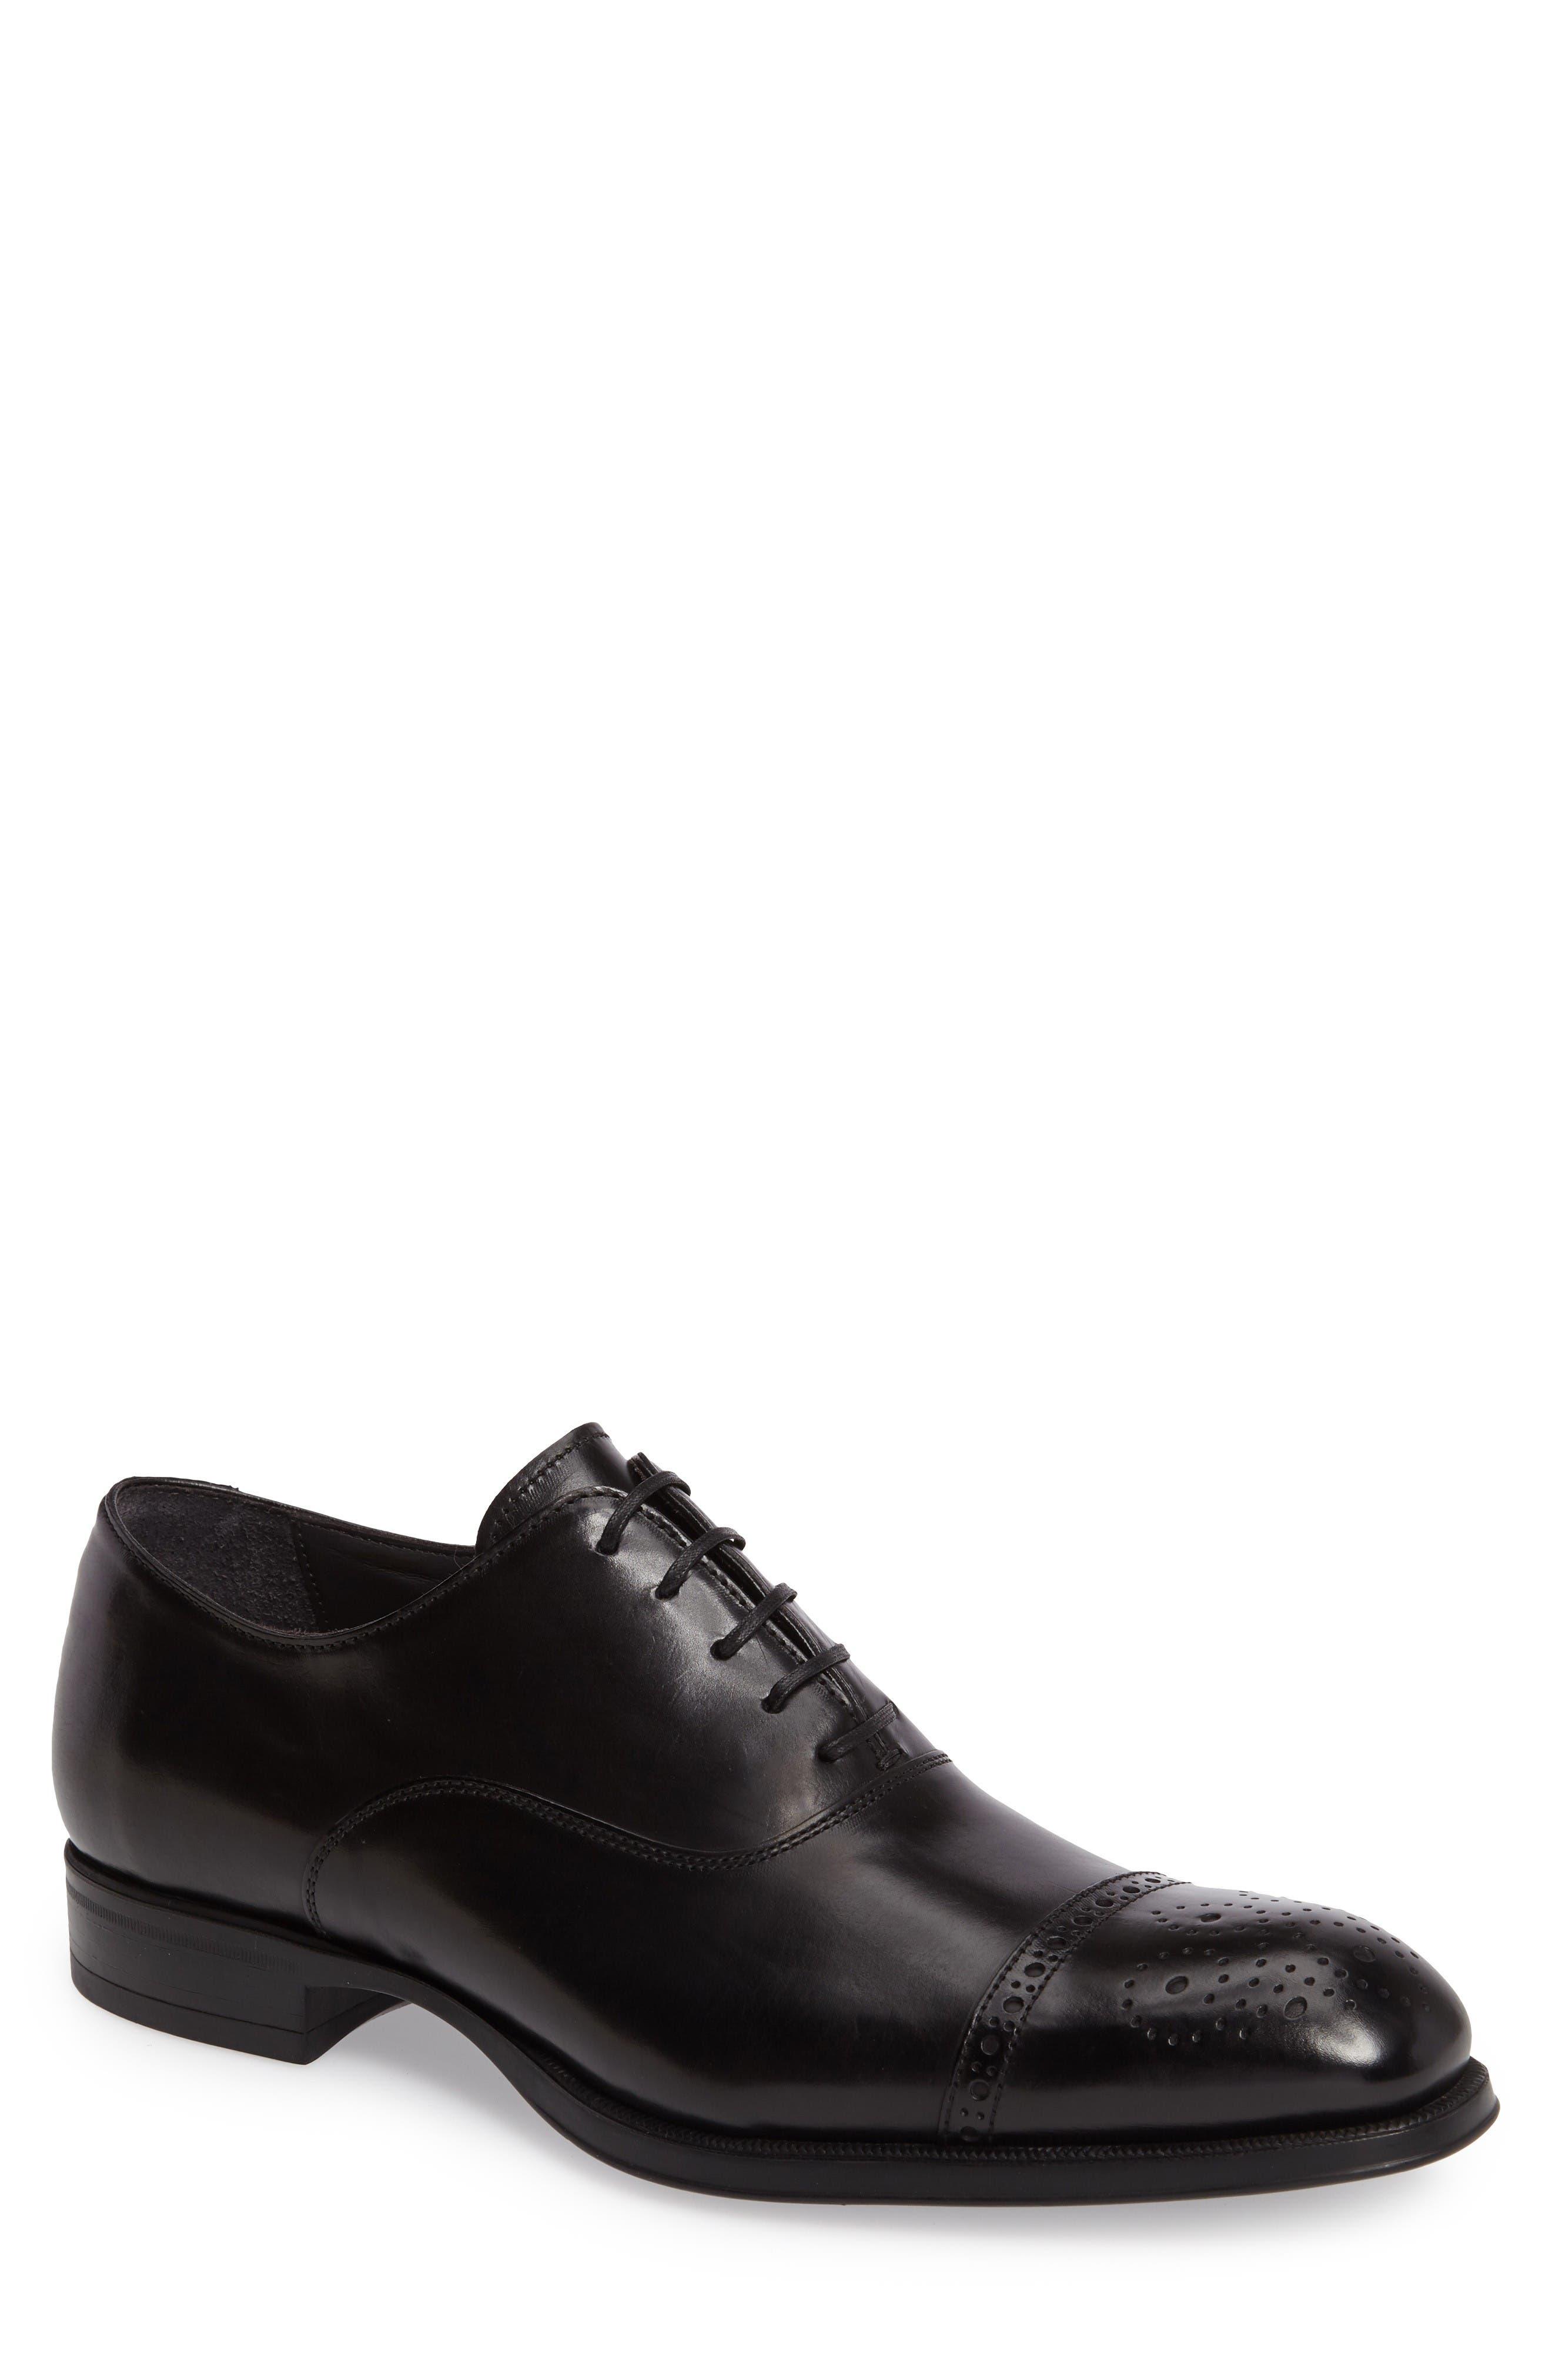 Alternate Image 1 Selected - To Boot New York 'Justin' Cap Toe Oxford (Men)